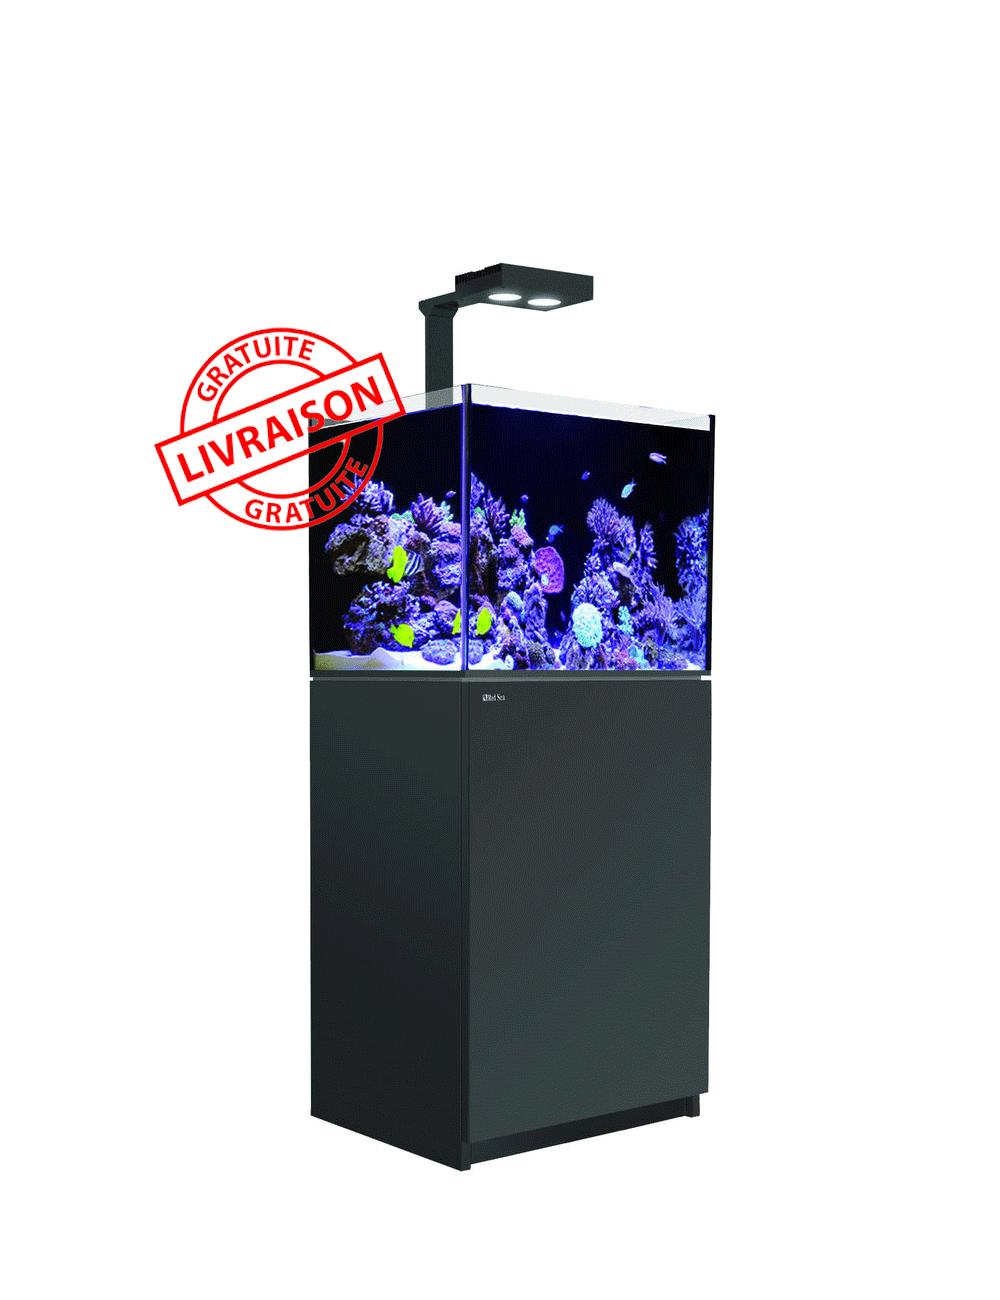 RED SEA - Aquarium Max® E-170 + LED AI Hydra 26™ HD - Meuble Noir + Décantation - 170 litres